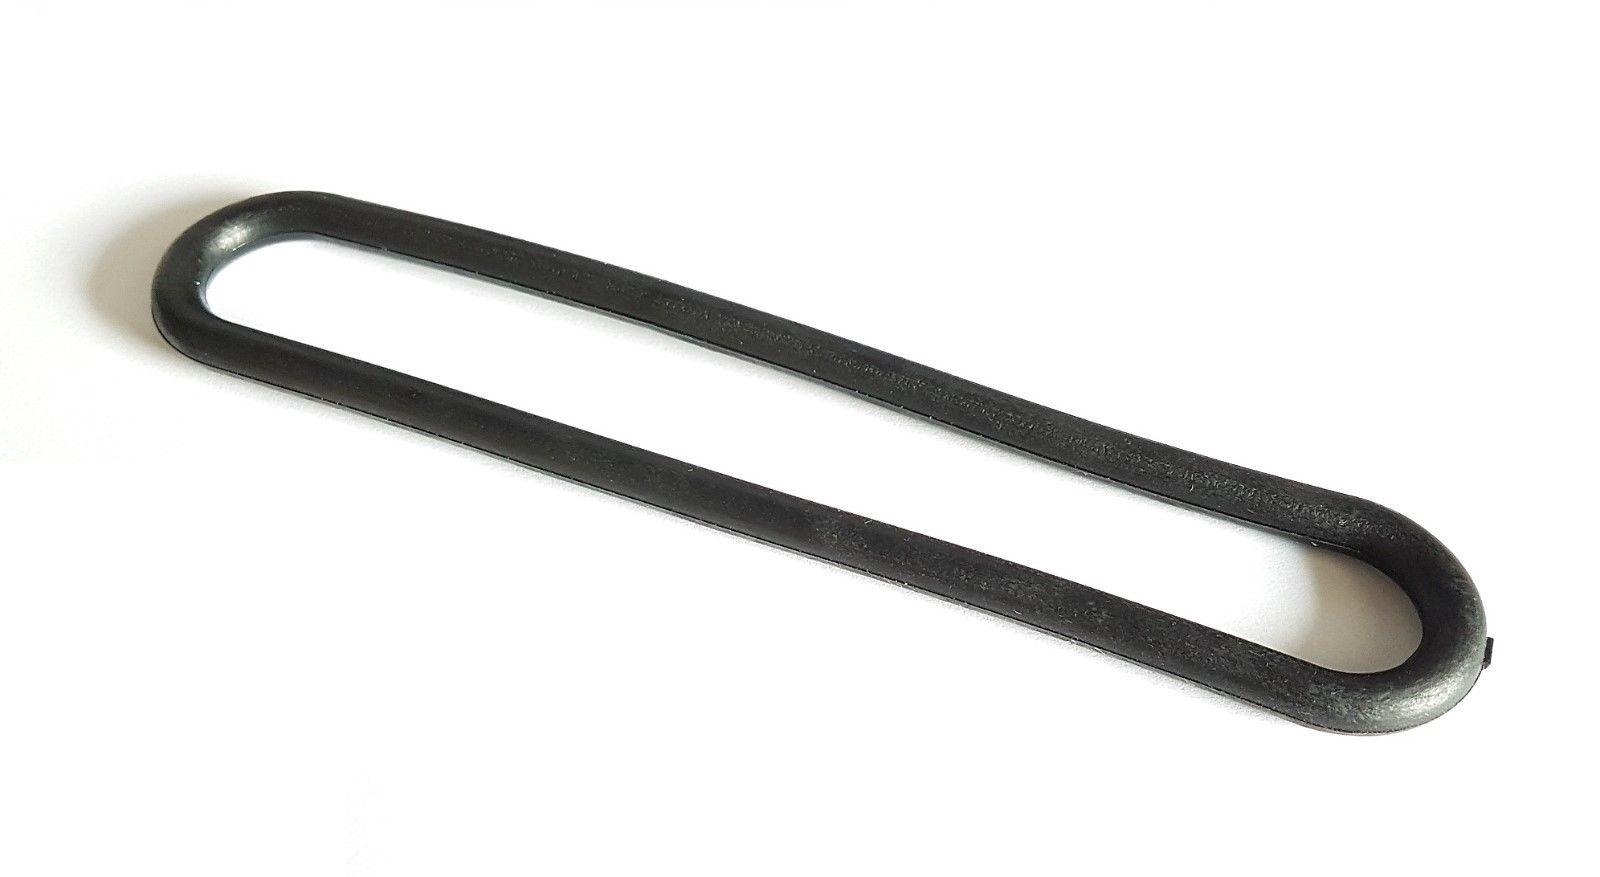 spanrubbers zwart 40 cm 8 mm dik